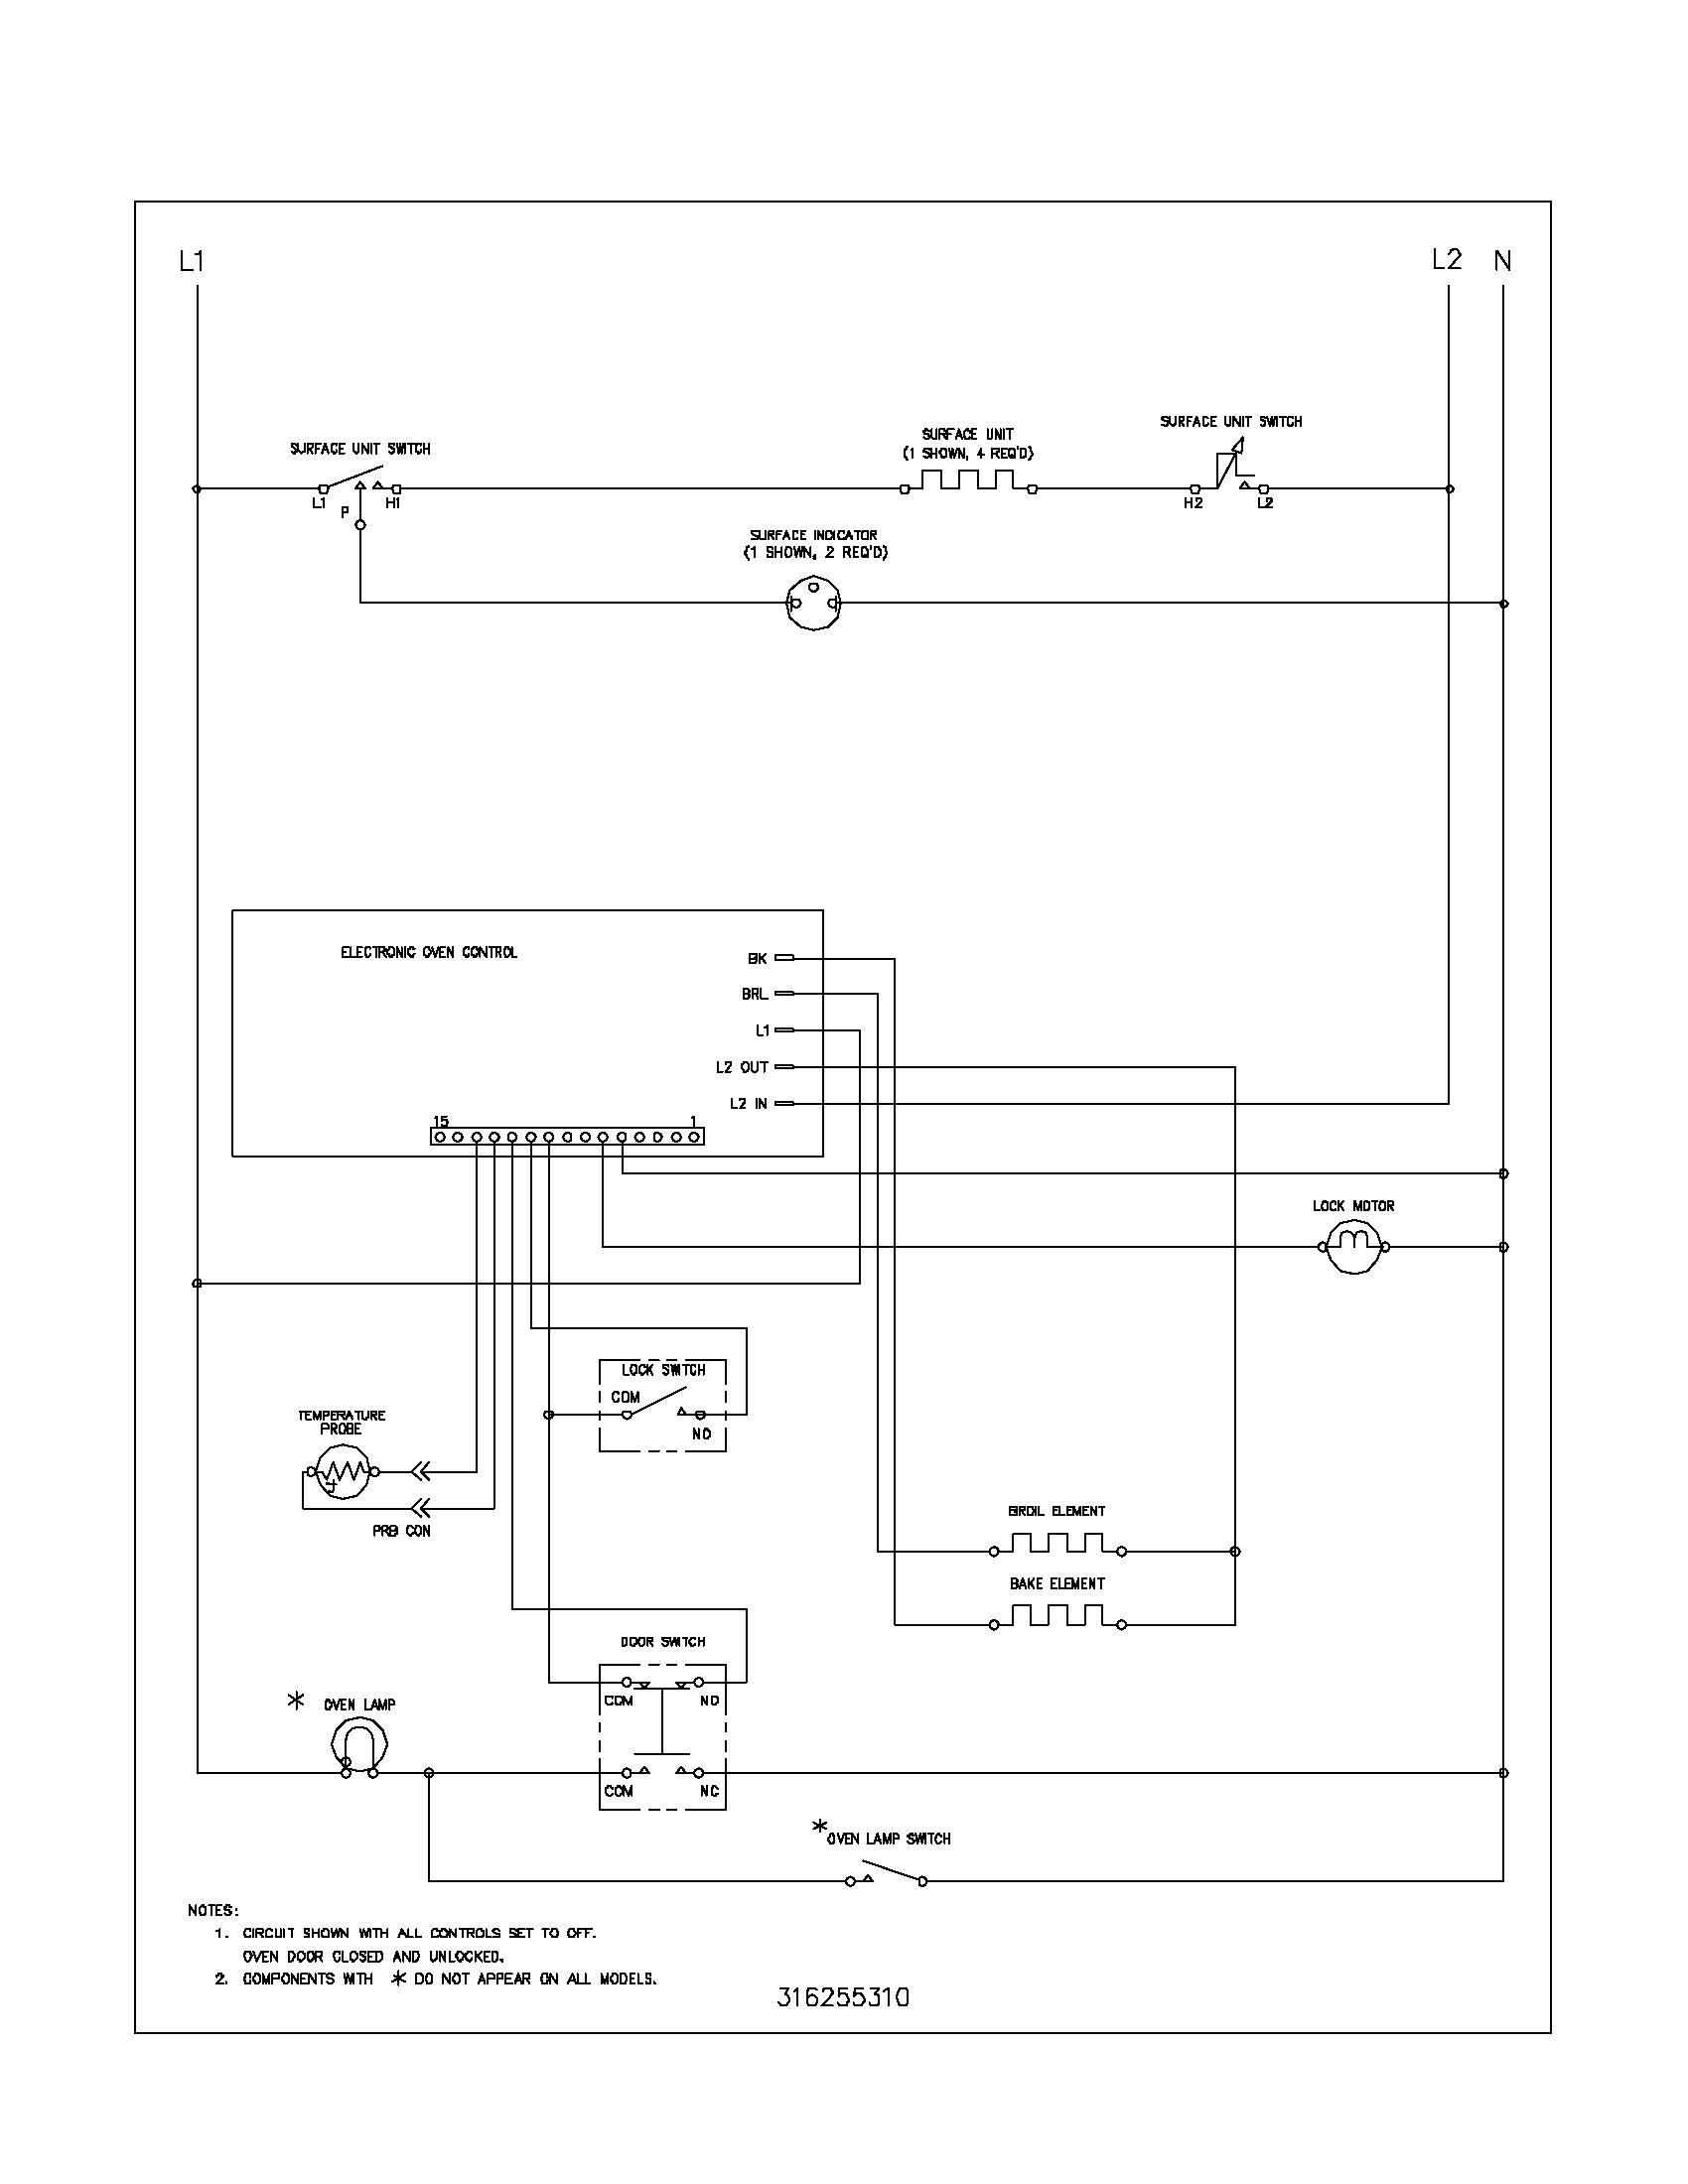 ge stove wiring schematic manual e bookge stove wiring diagram 10 [ 1700 x 2200 Pixel ]